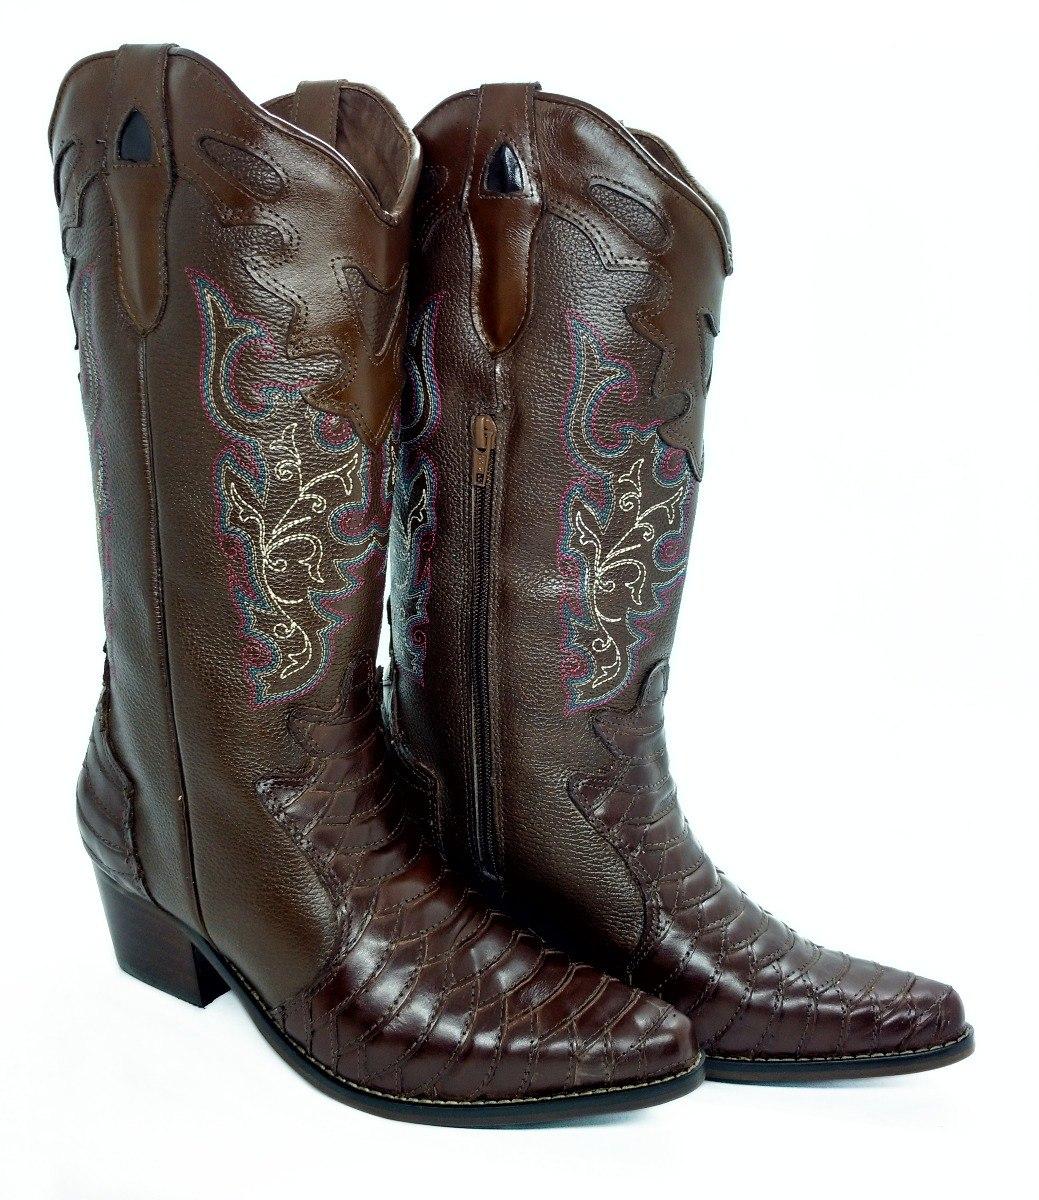 45bb8c6f8f1 bota country texana montaria bico fino escamada feminina. Carregando zoom.